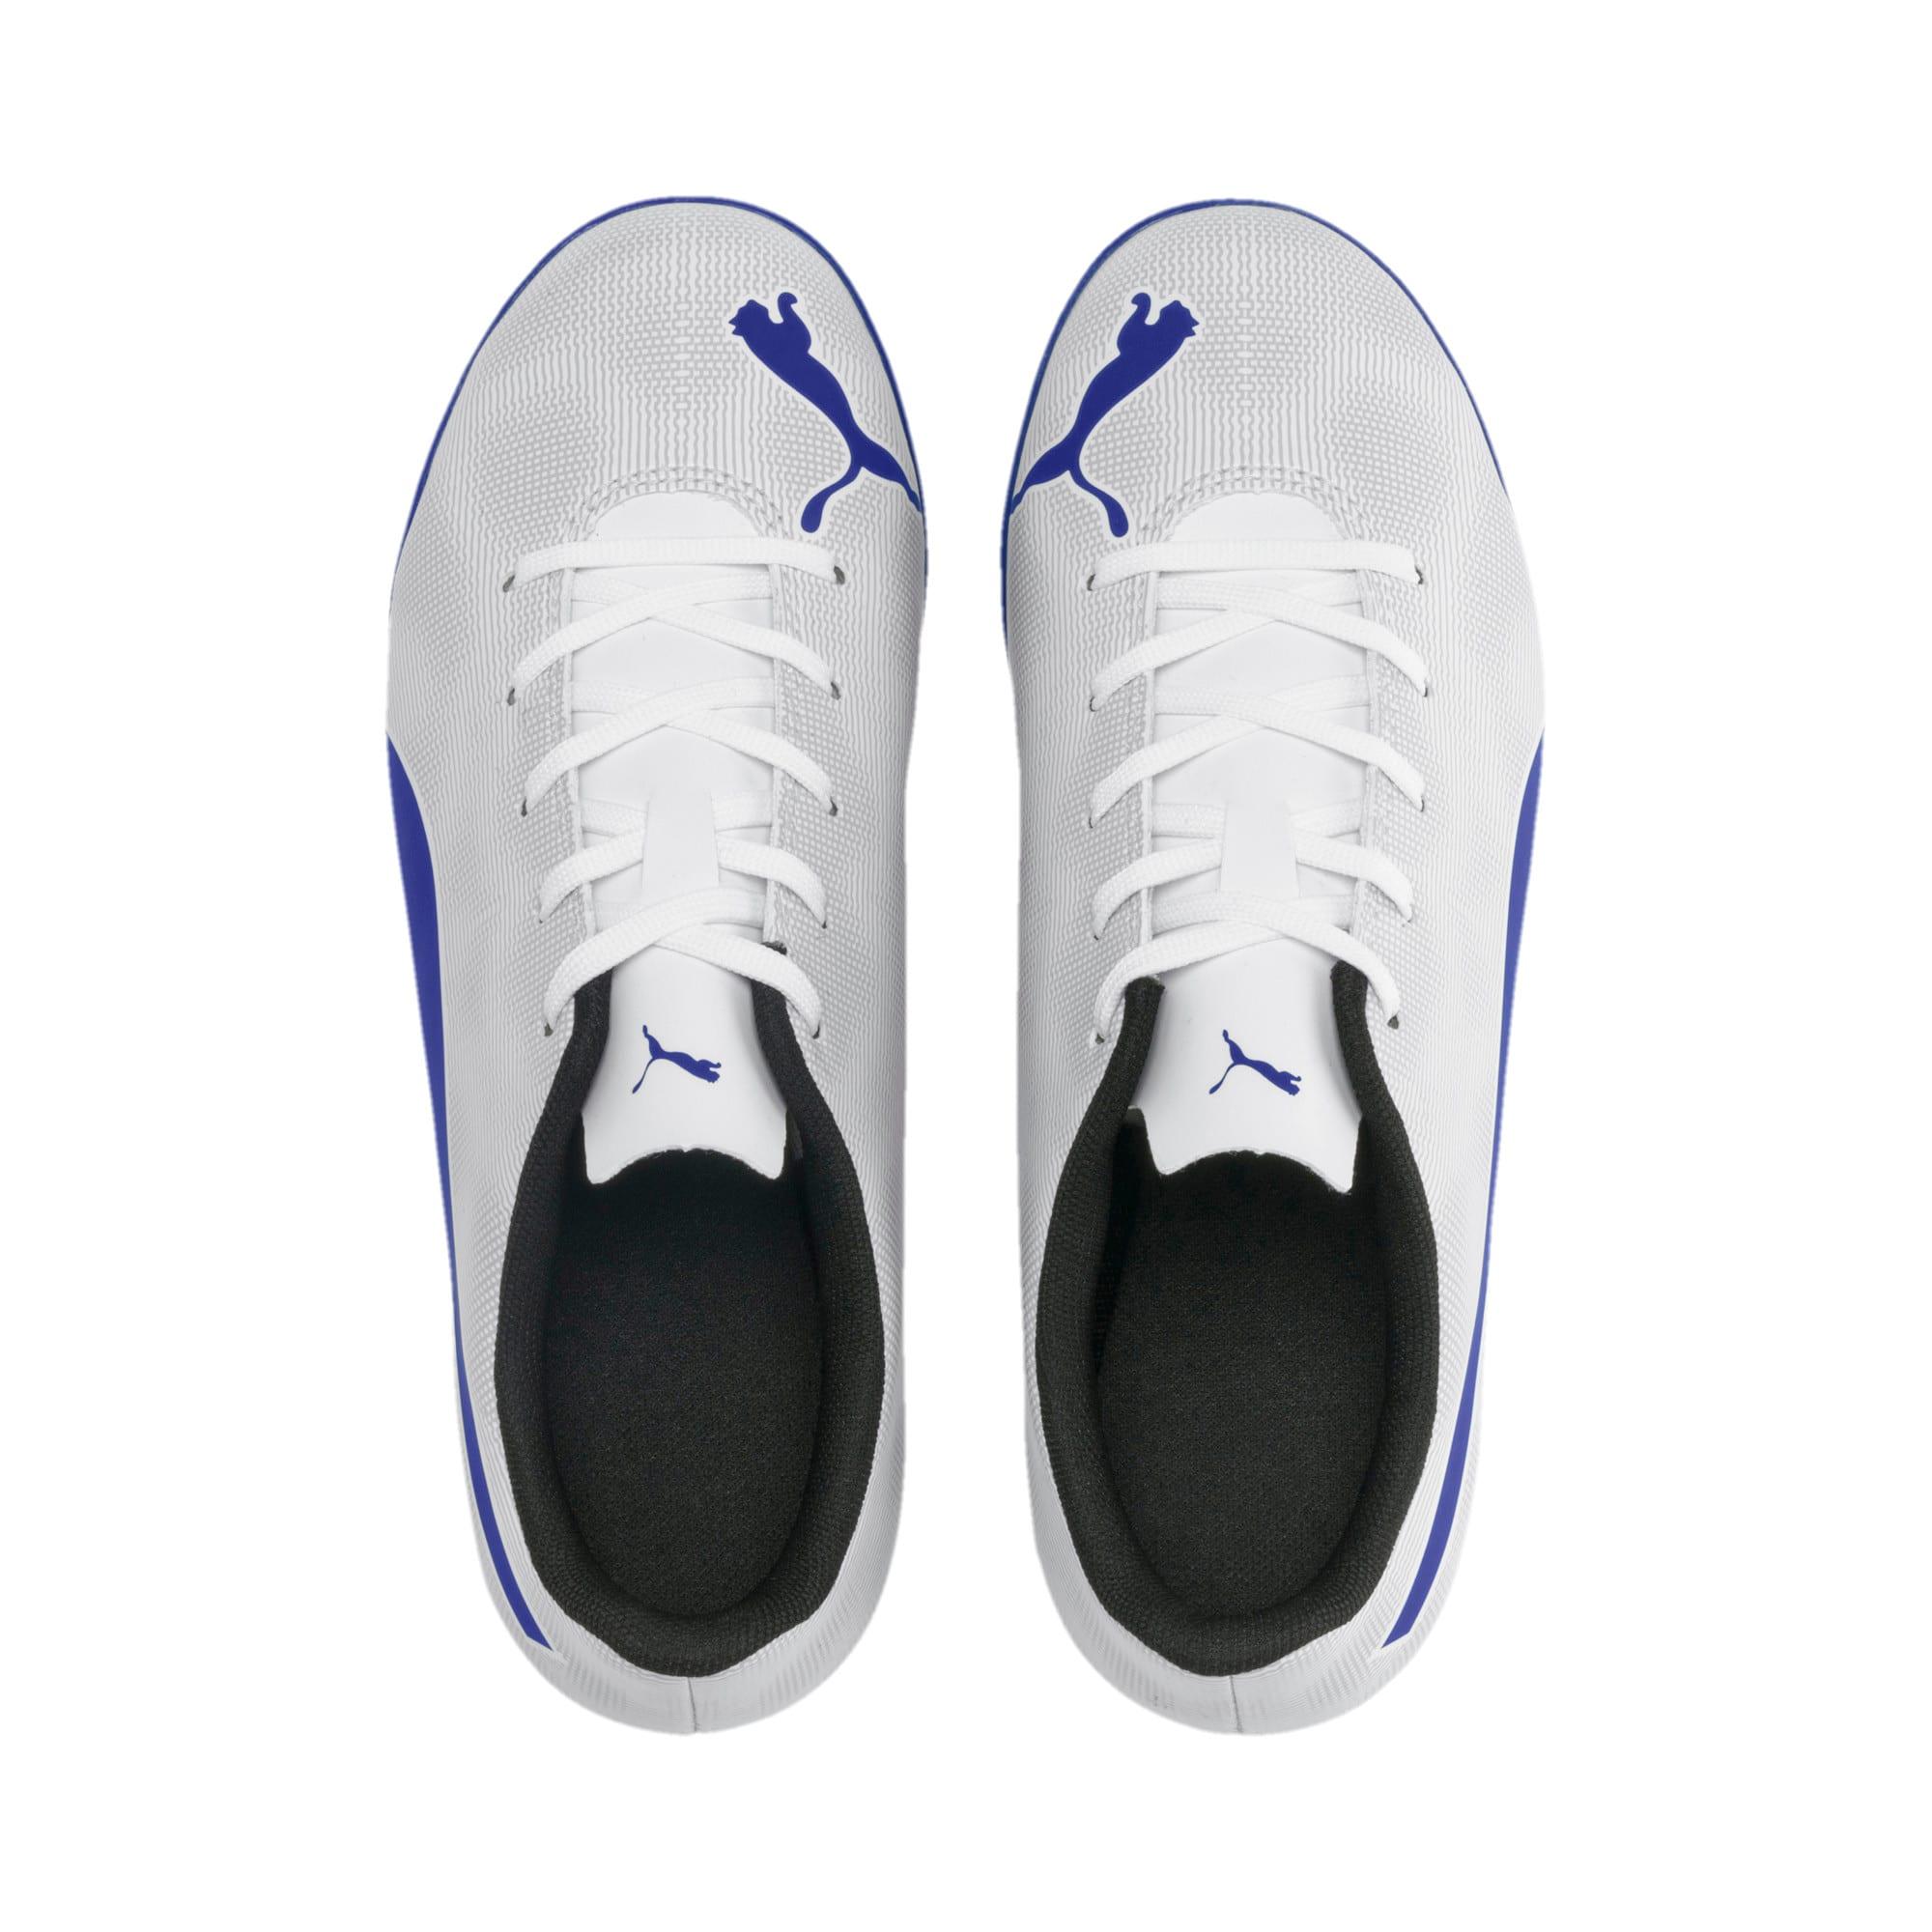 Thumbnail 6 of Rapido TT Boy's Soccer Cleats JR, White-Royal Blue-Light Gray, medium